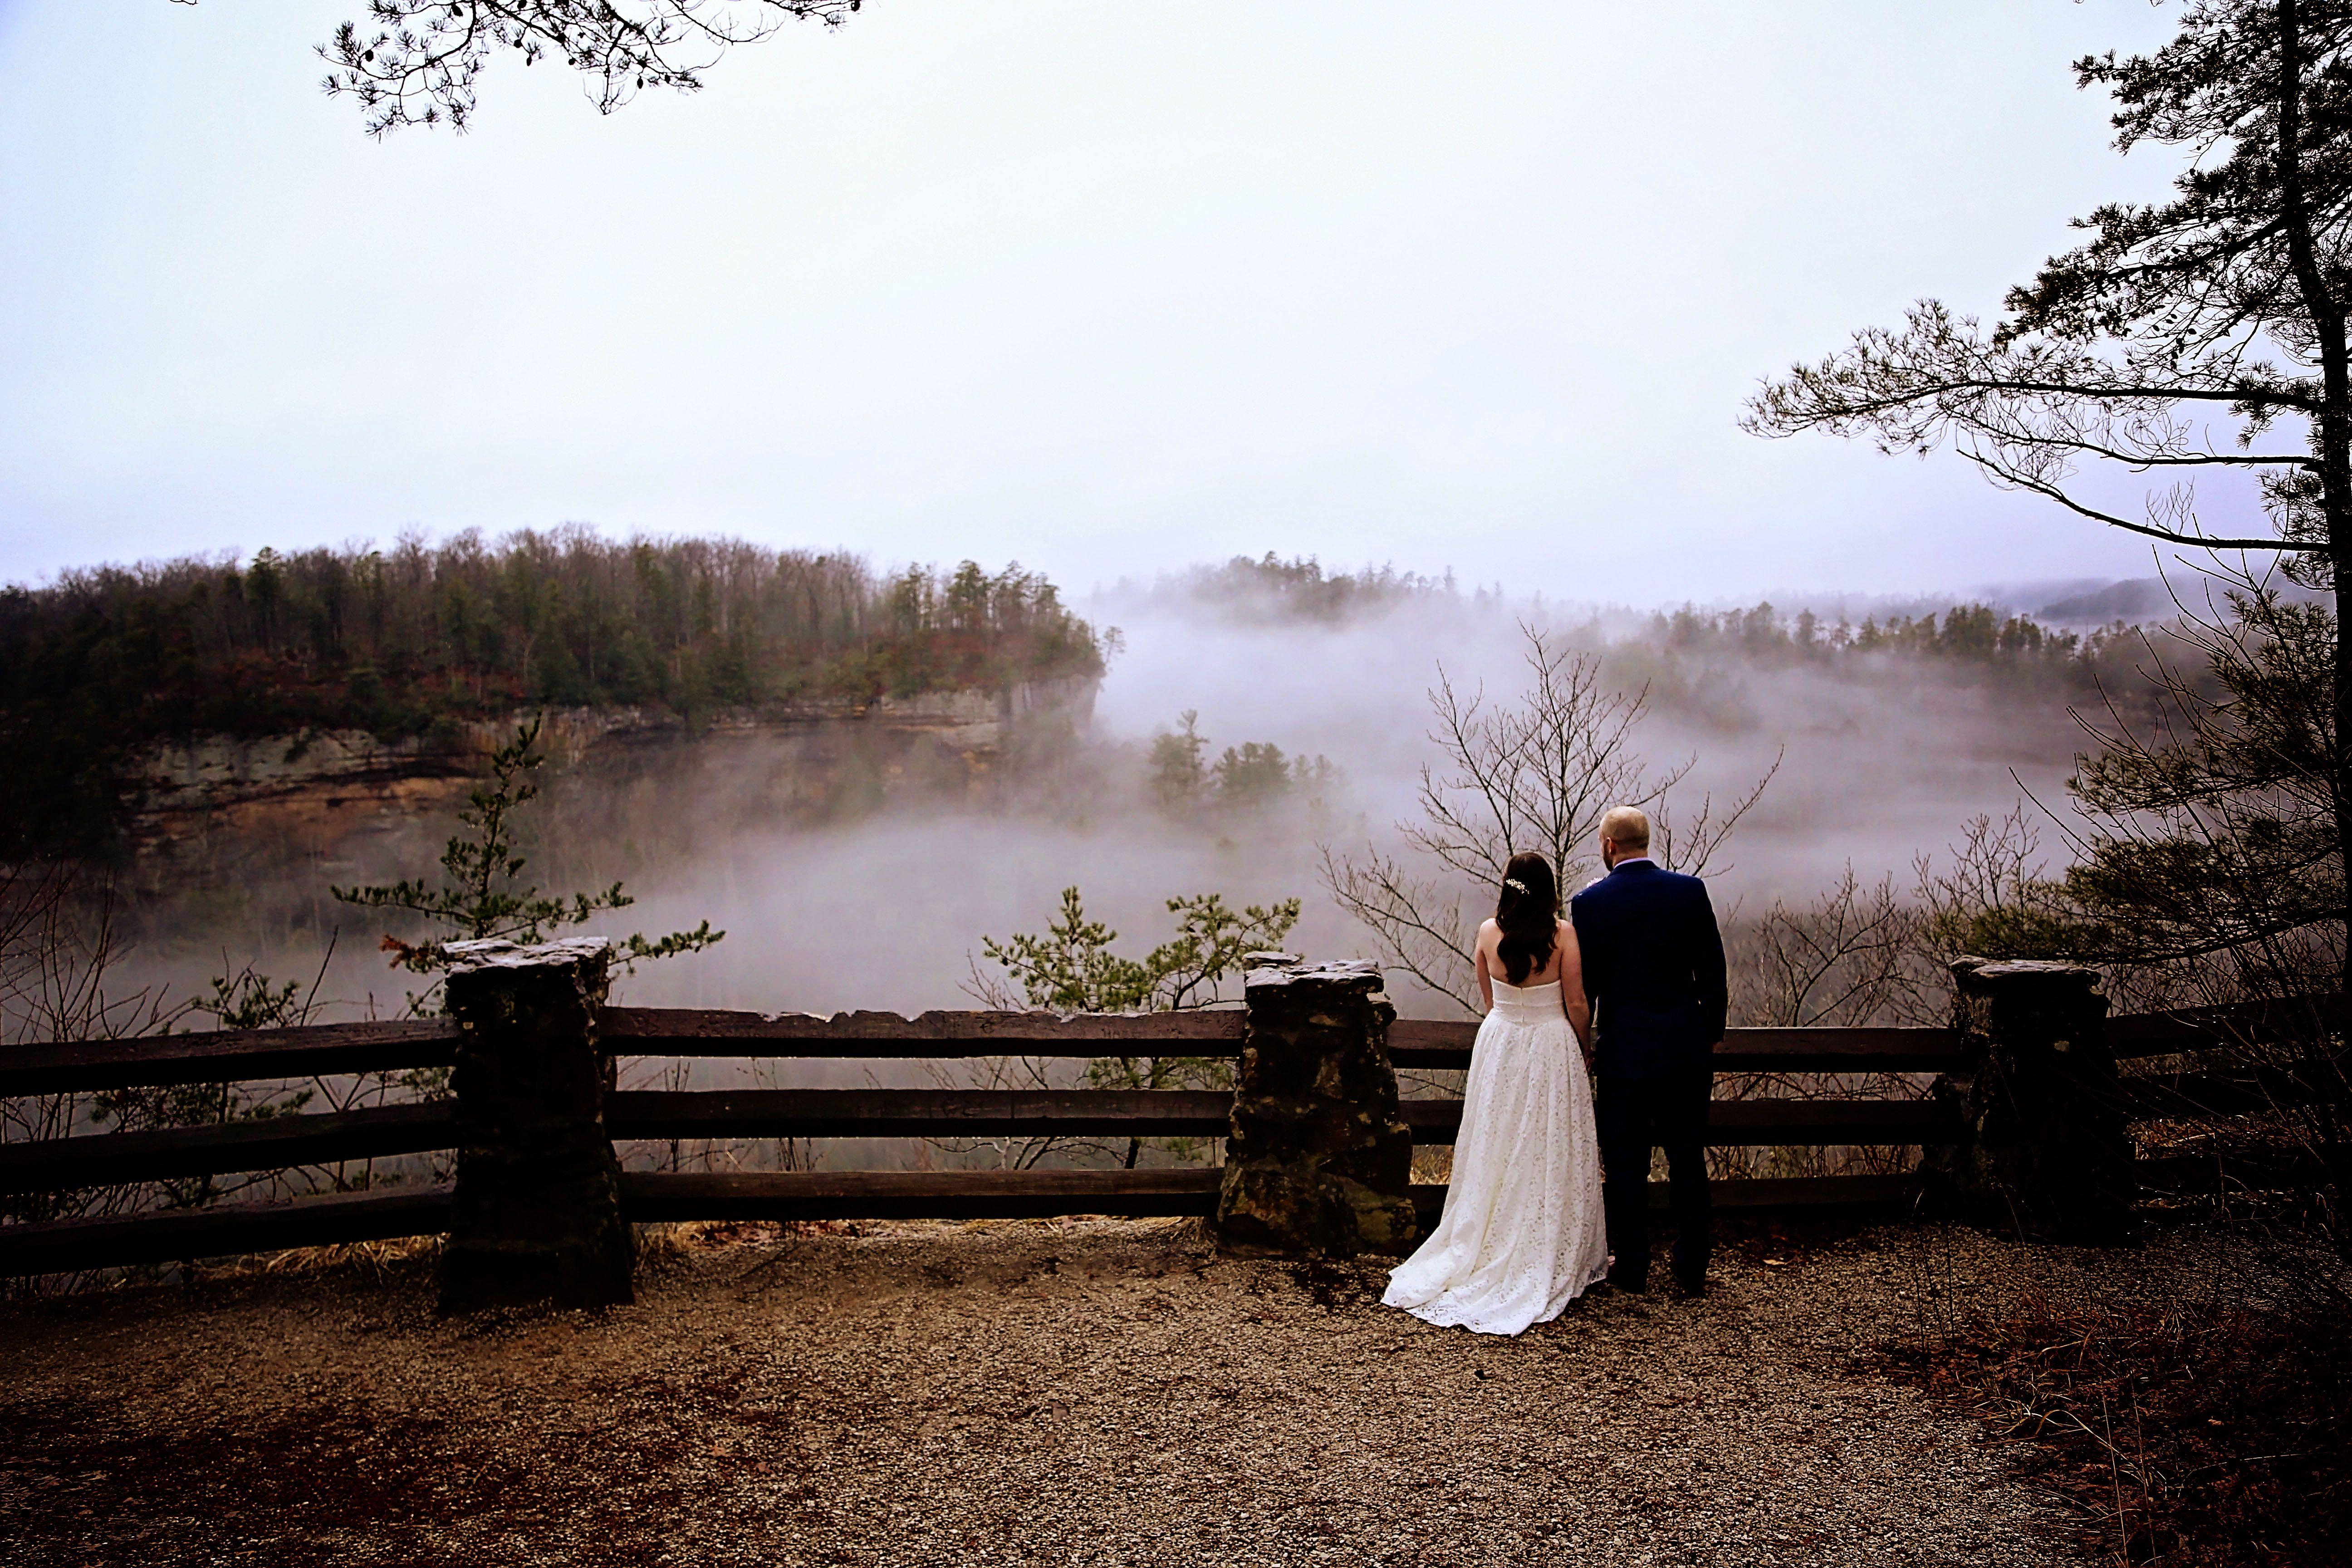 Kentucky Elopement And Destination Wedding Red River Gorge Wedding Tiny Wedding Small Destination Weddings Destination Wedding Etiquette